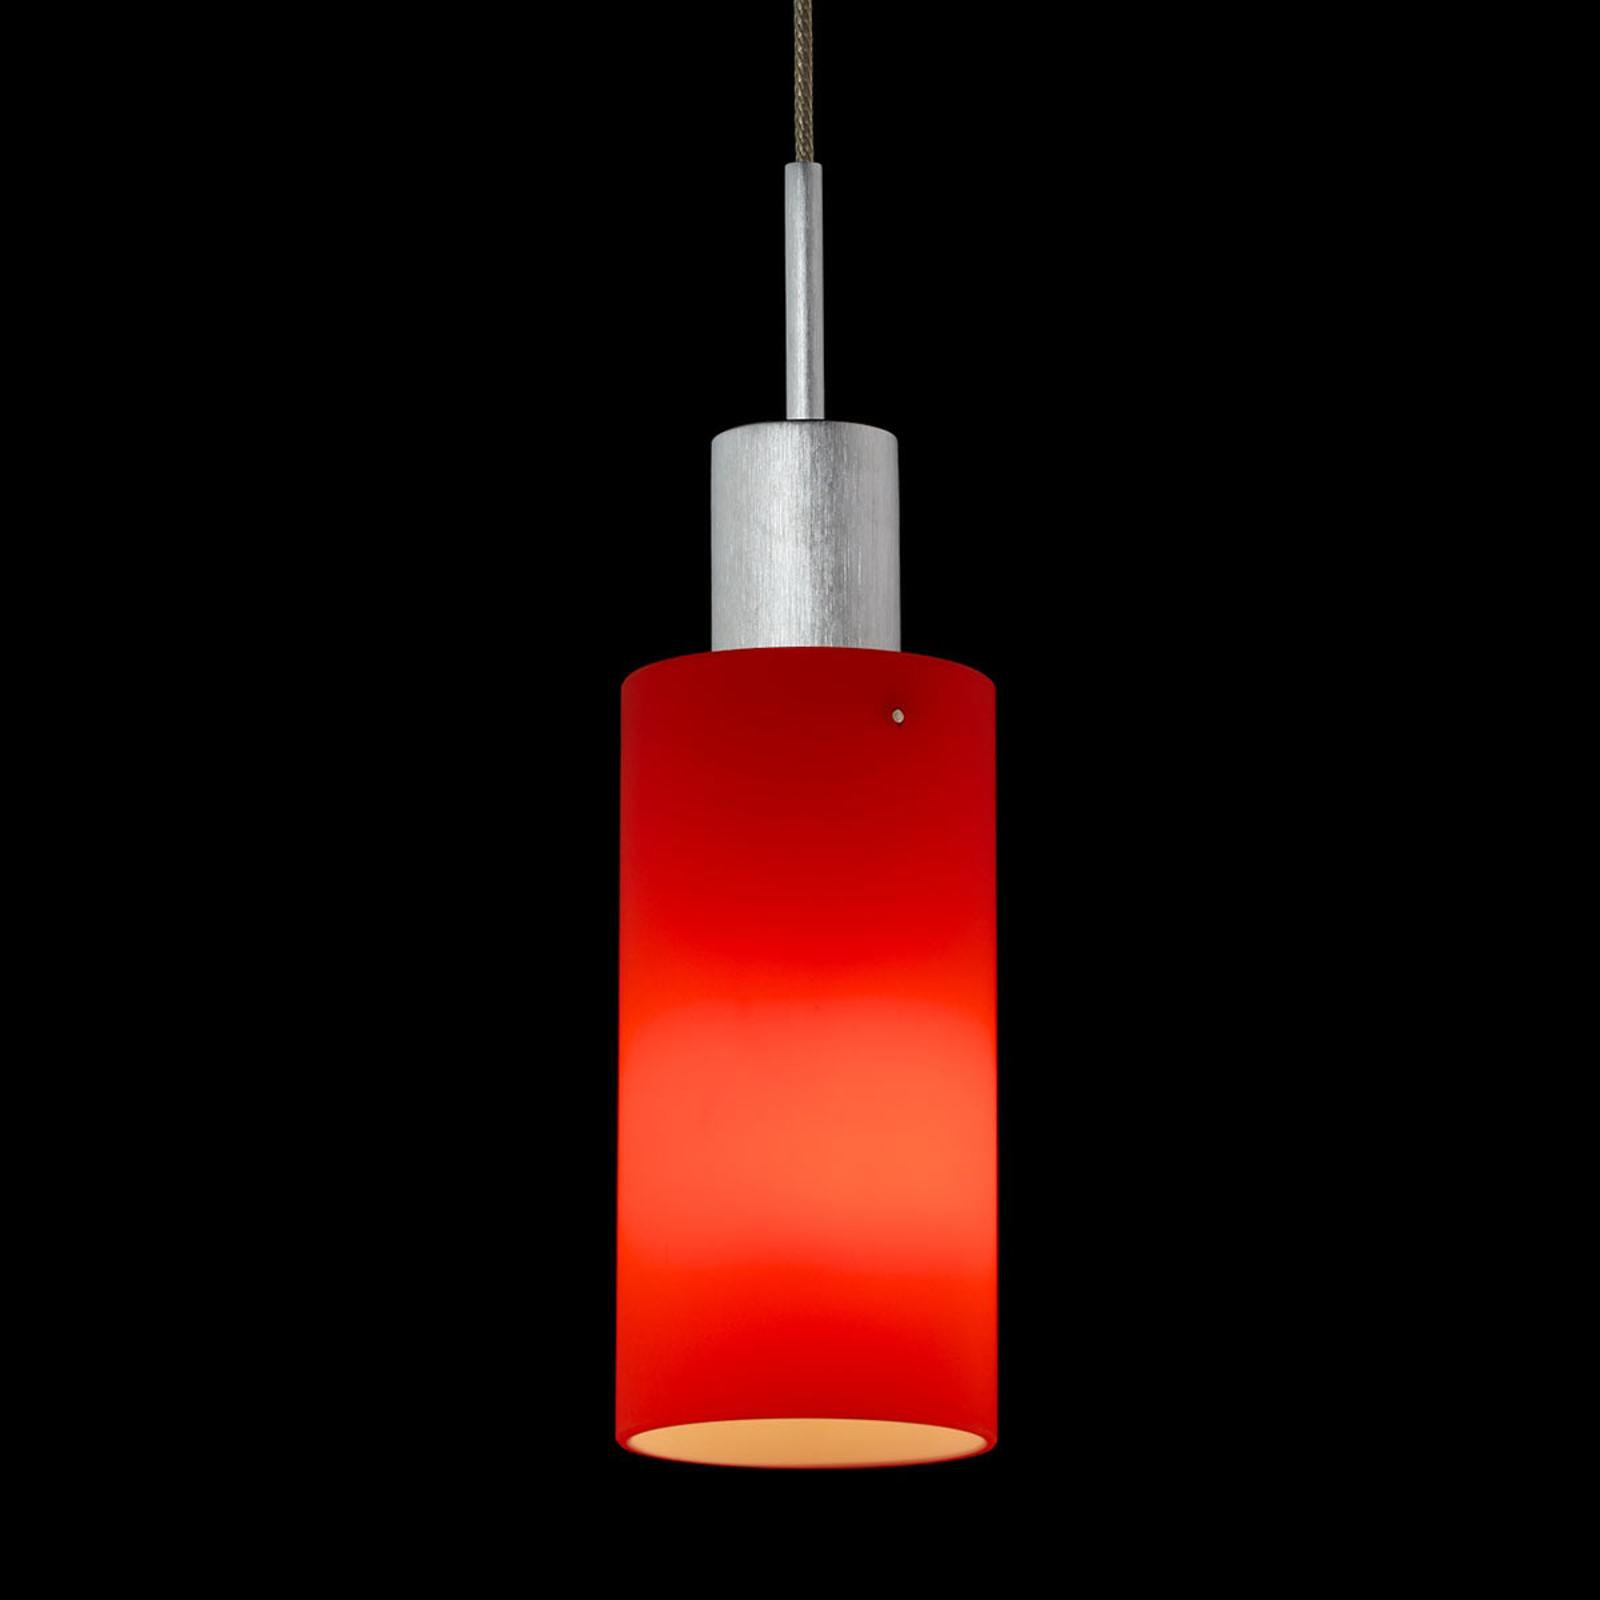 LDM Mono Uno pendellampe, matteret rød